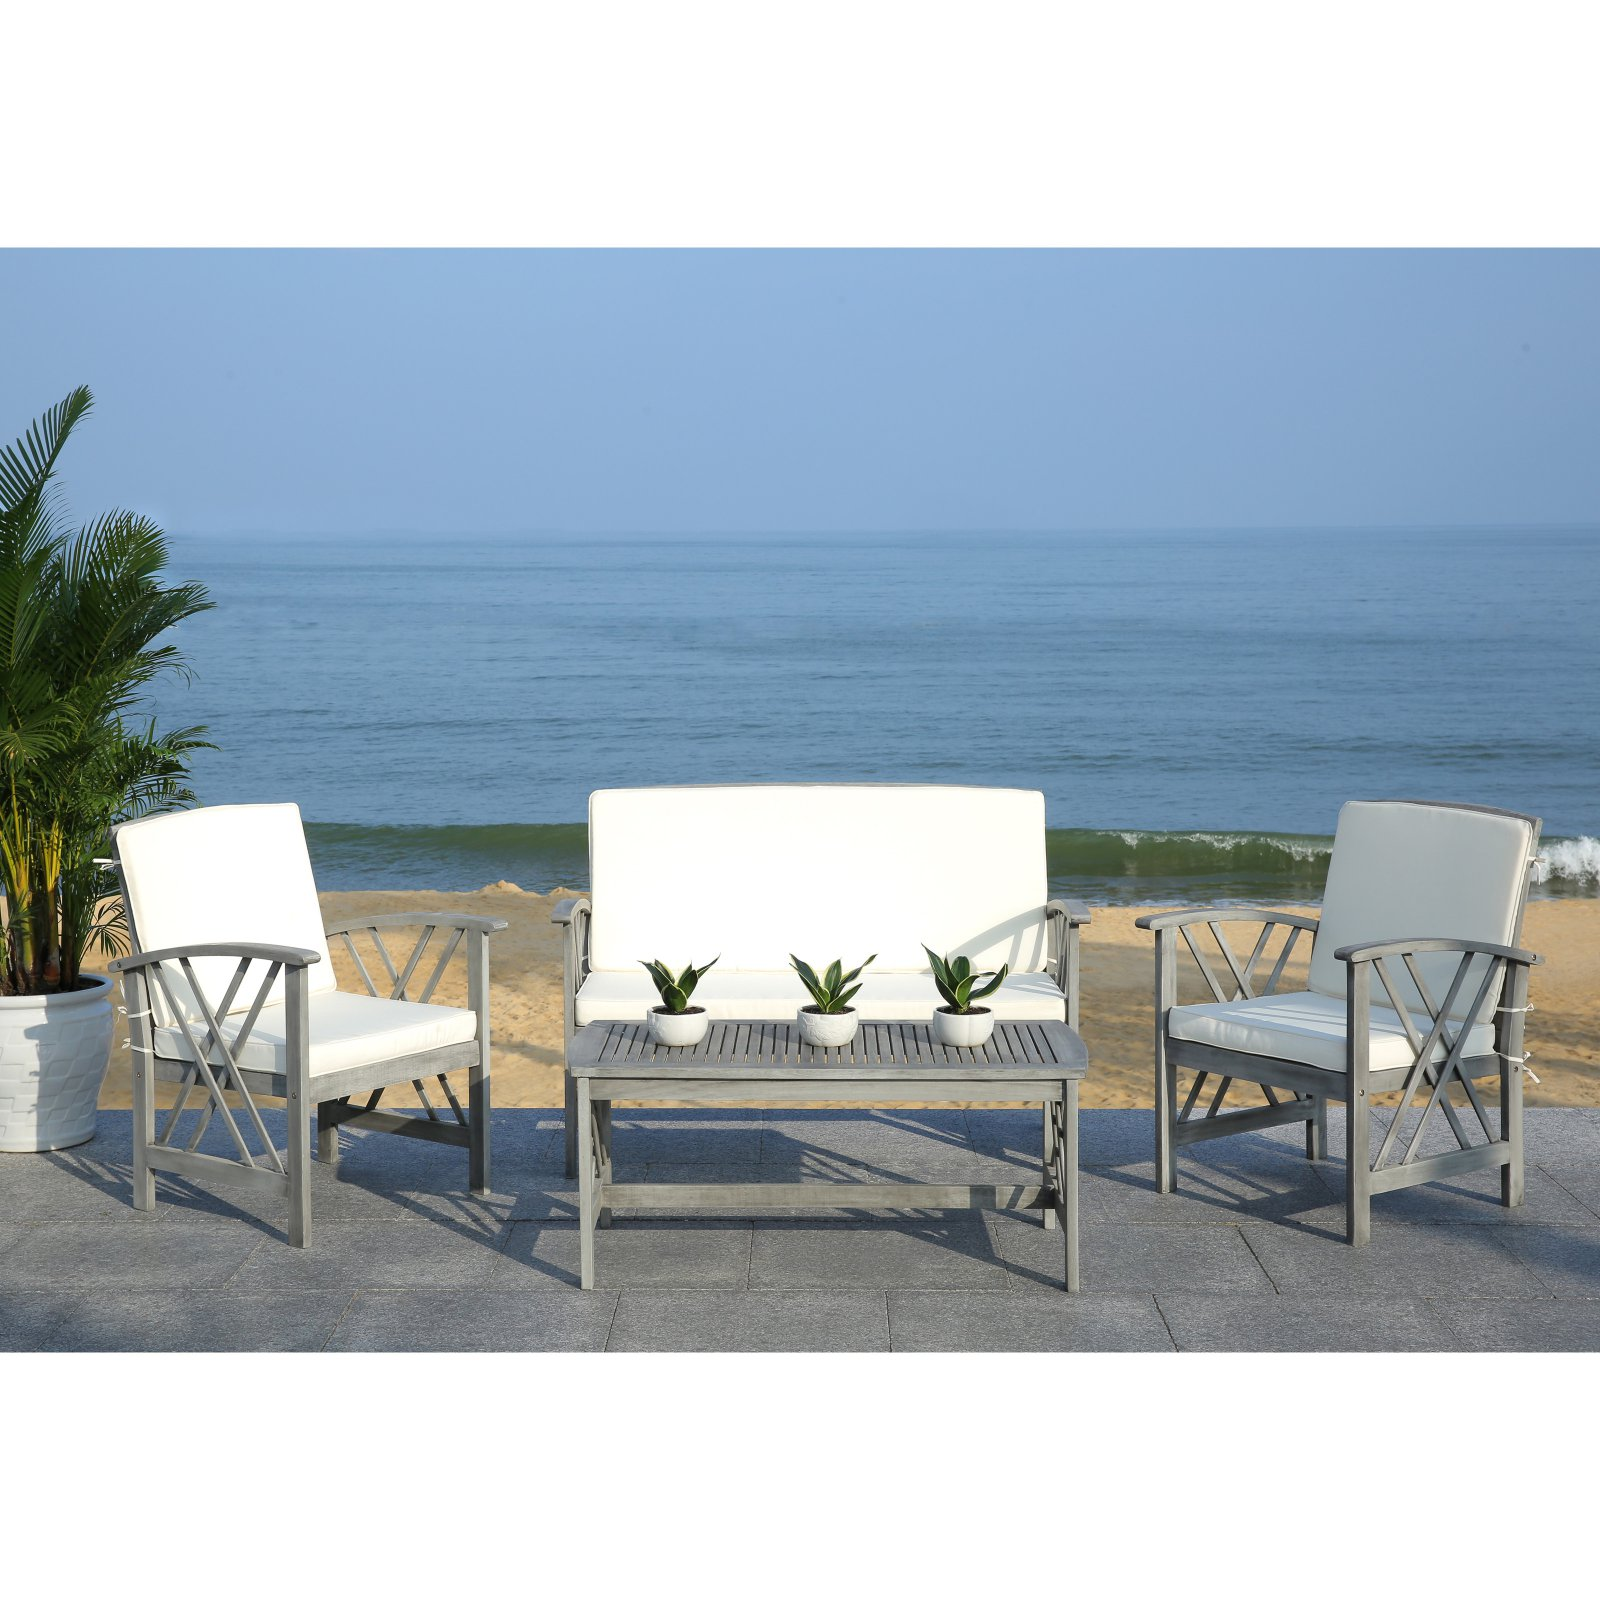 Safavieh Fontana Outdoor Modern 4 Piece Living Set with ... on Safavieh Fontana Patio Set id=40773